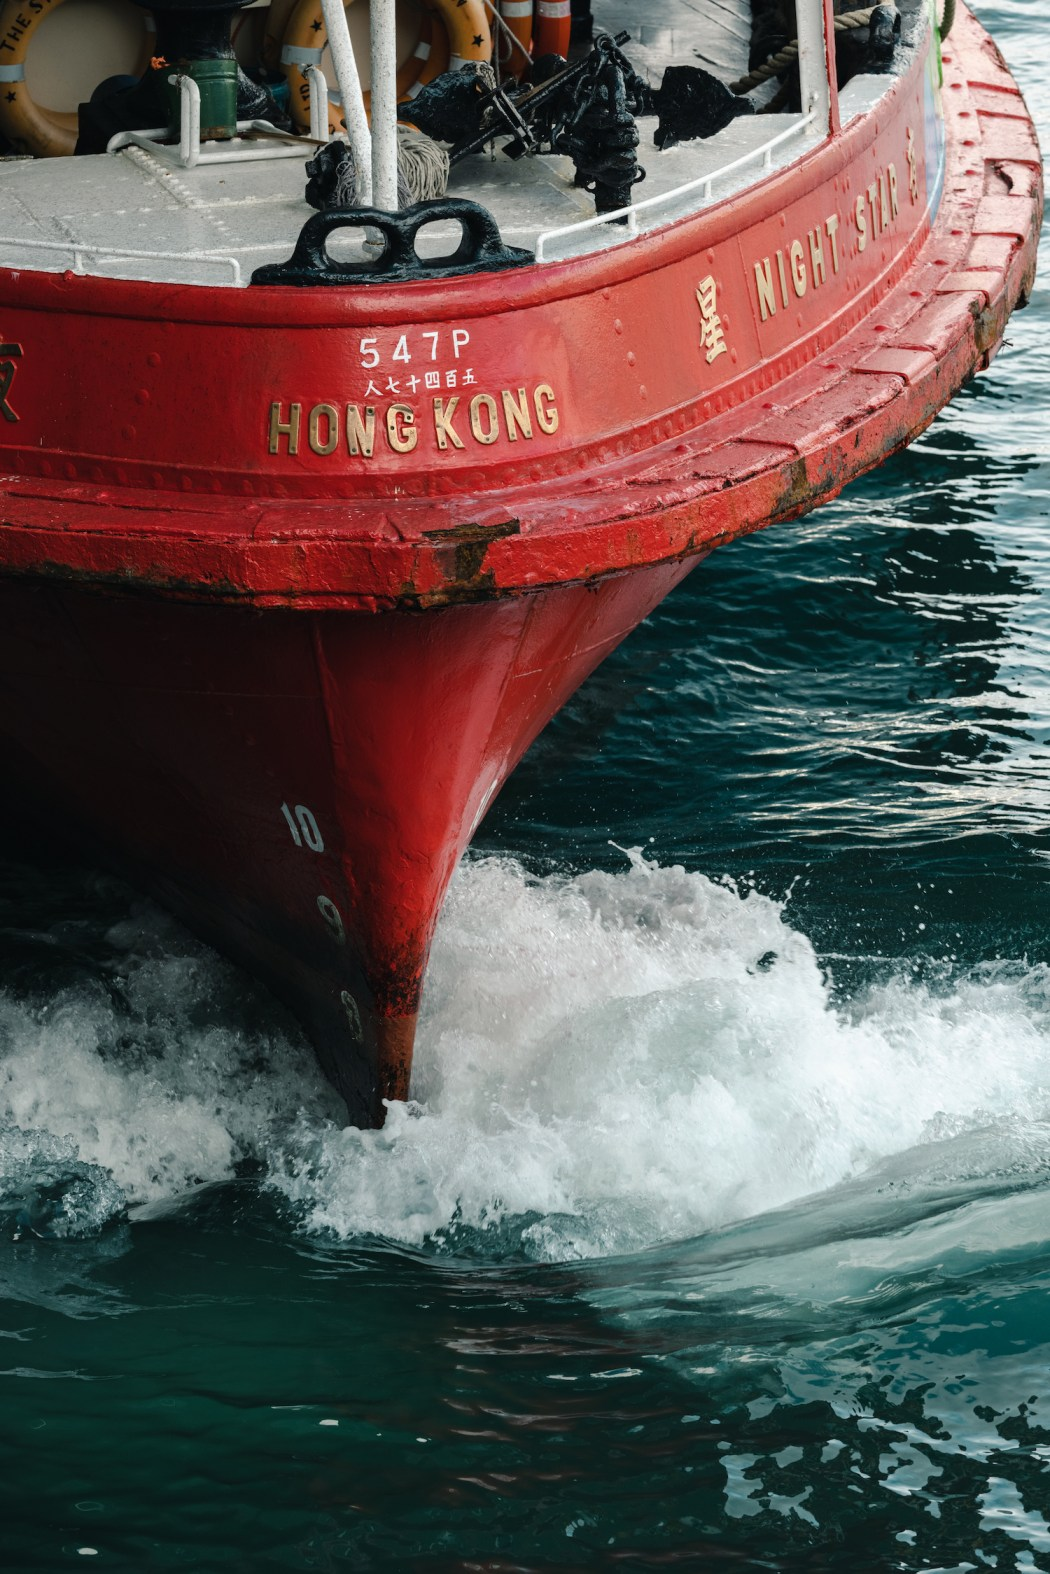 Jeremy Cheung - Old Ride, New Splash